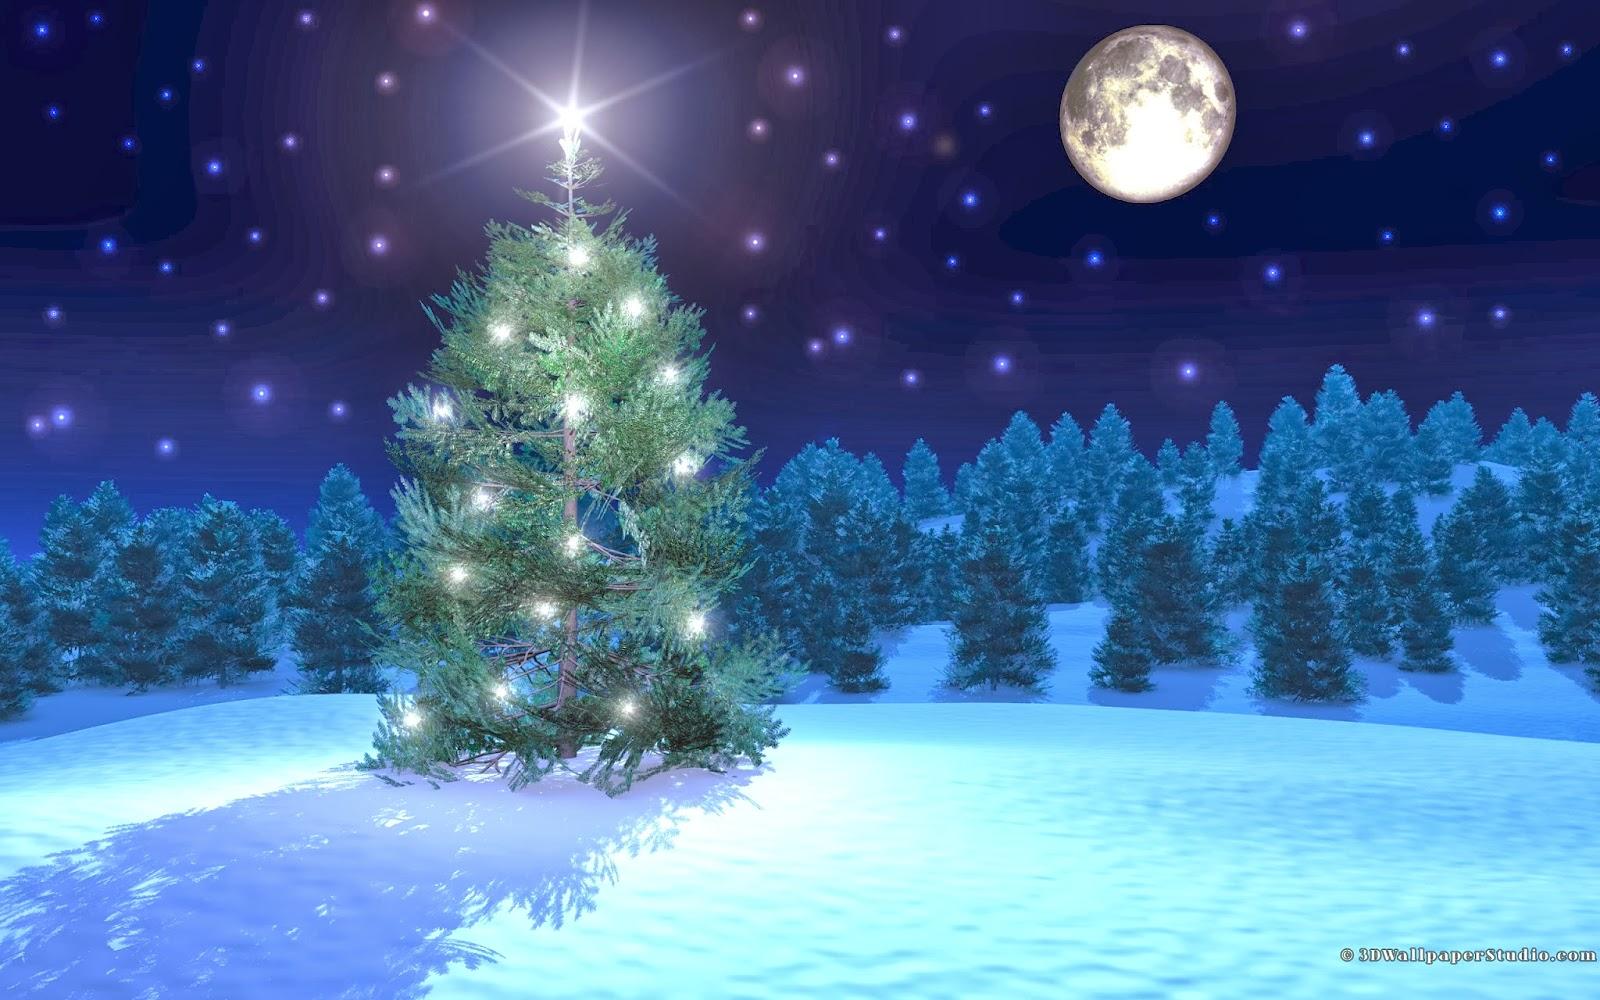 Free 3d Desktop Wallpaper Christmas Tatoos Army 3d Christmas Tree For Desktop Hd Wallpaper Free